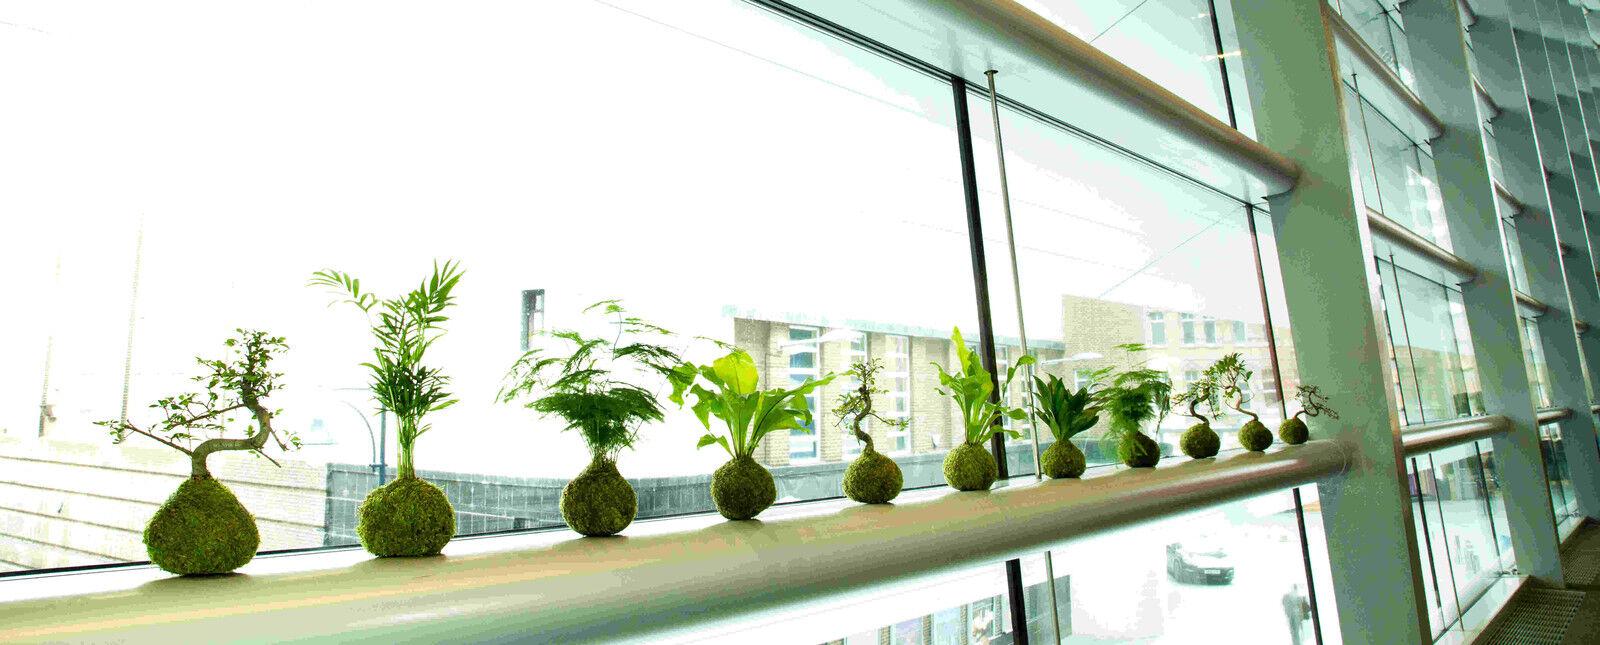 Tranquil Plants